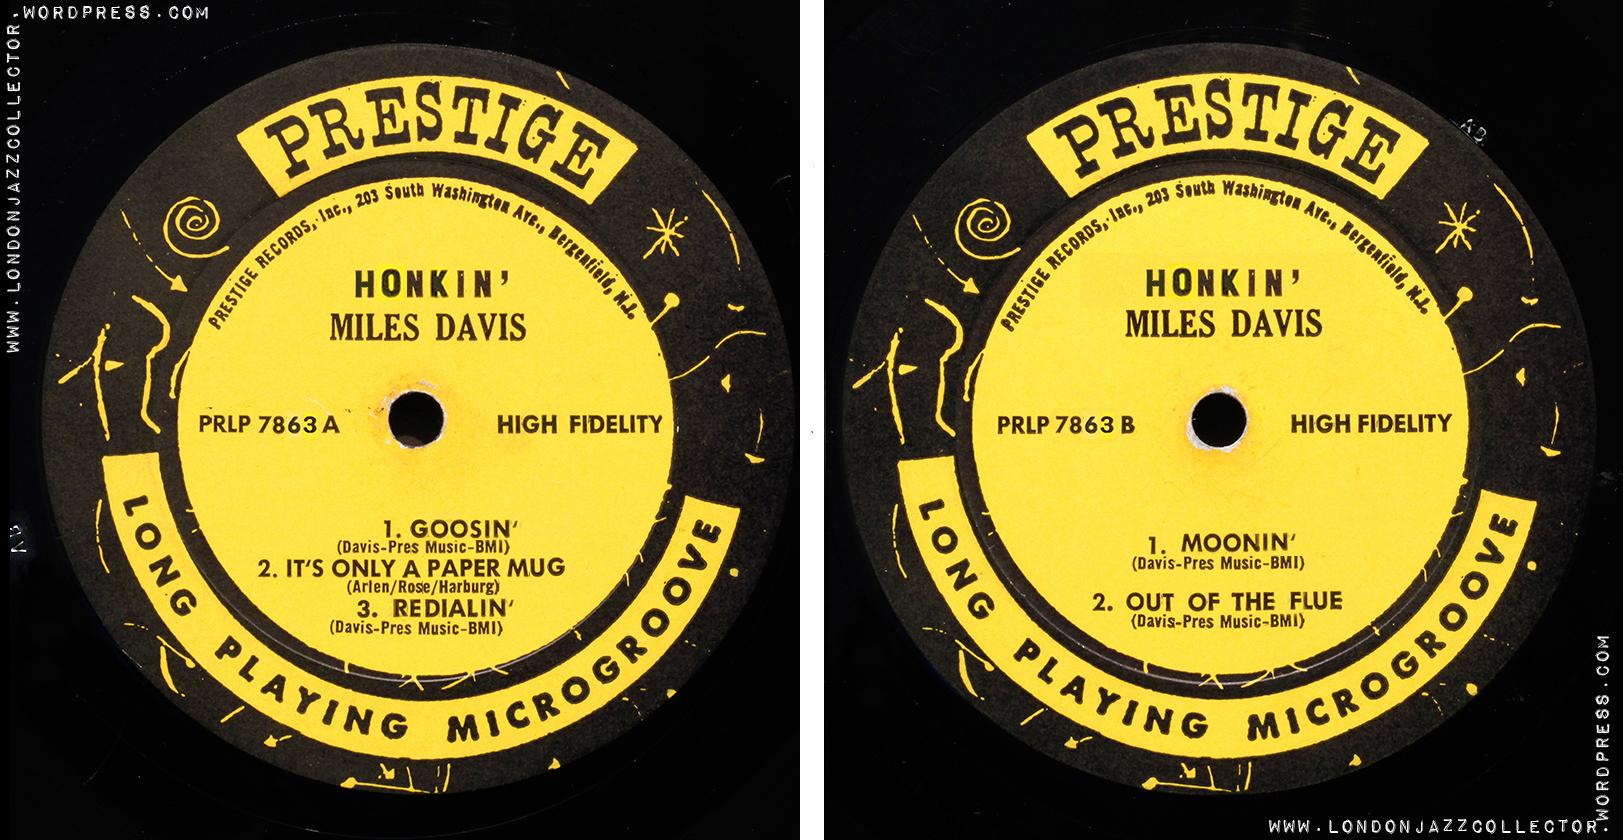 hight resolution of Miles Davis: Honkin' (1956) Prestige   LondonJazzCollector